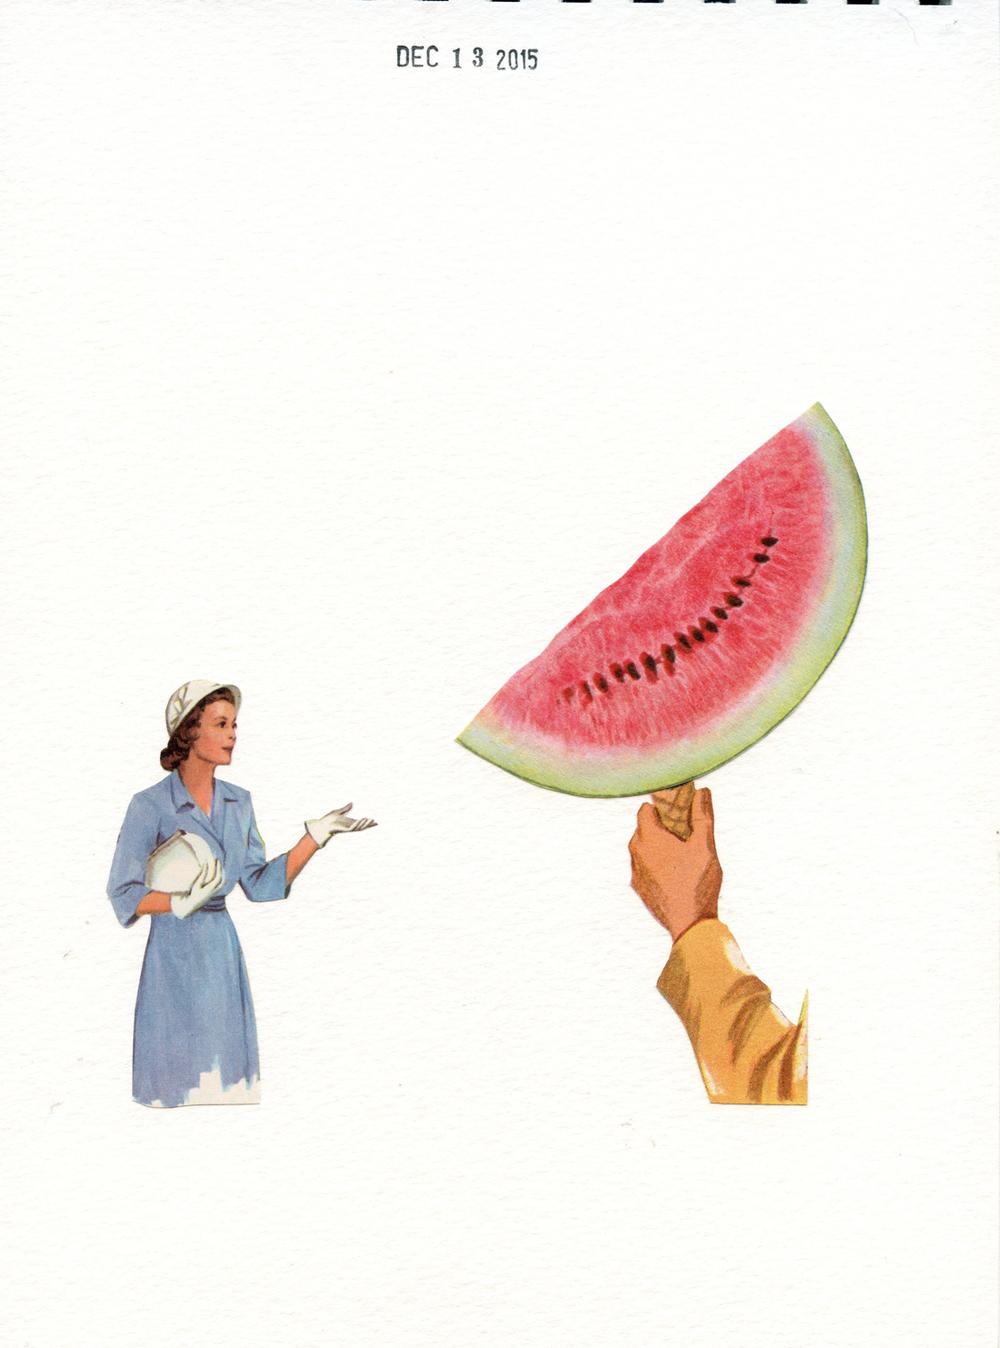 Watermelon Pop (71)